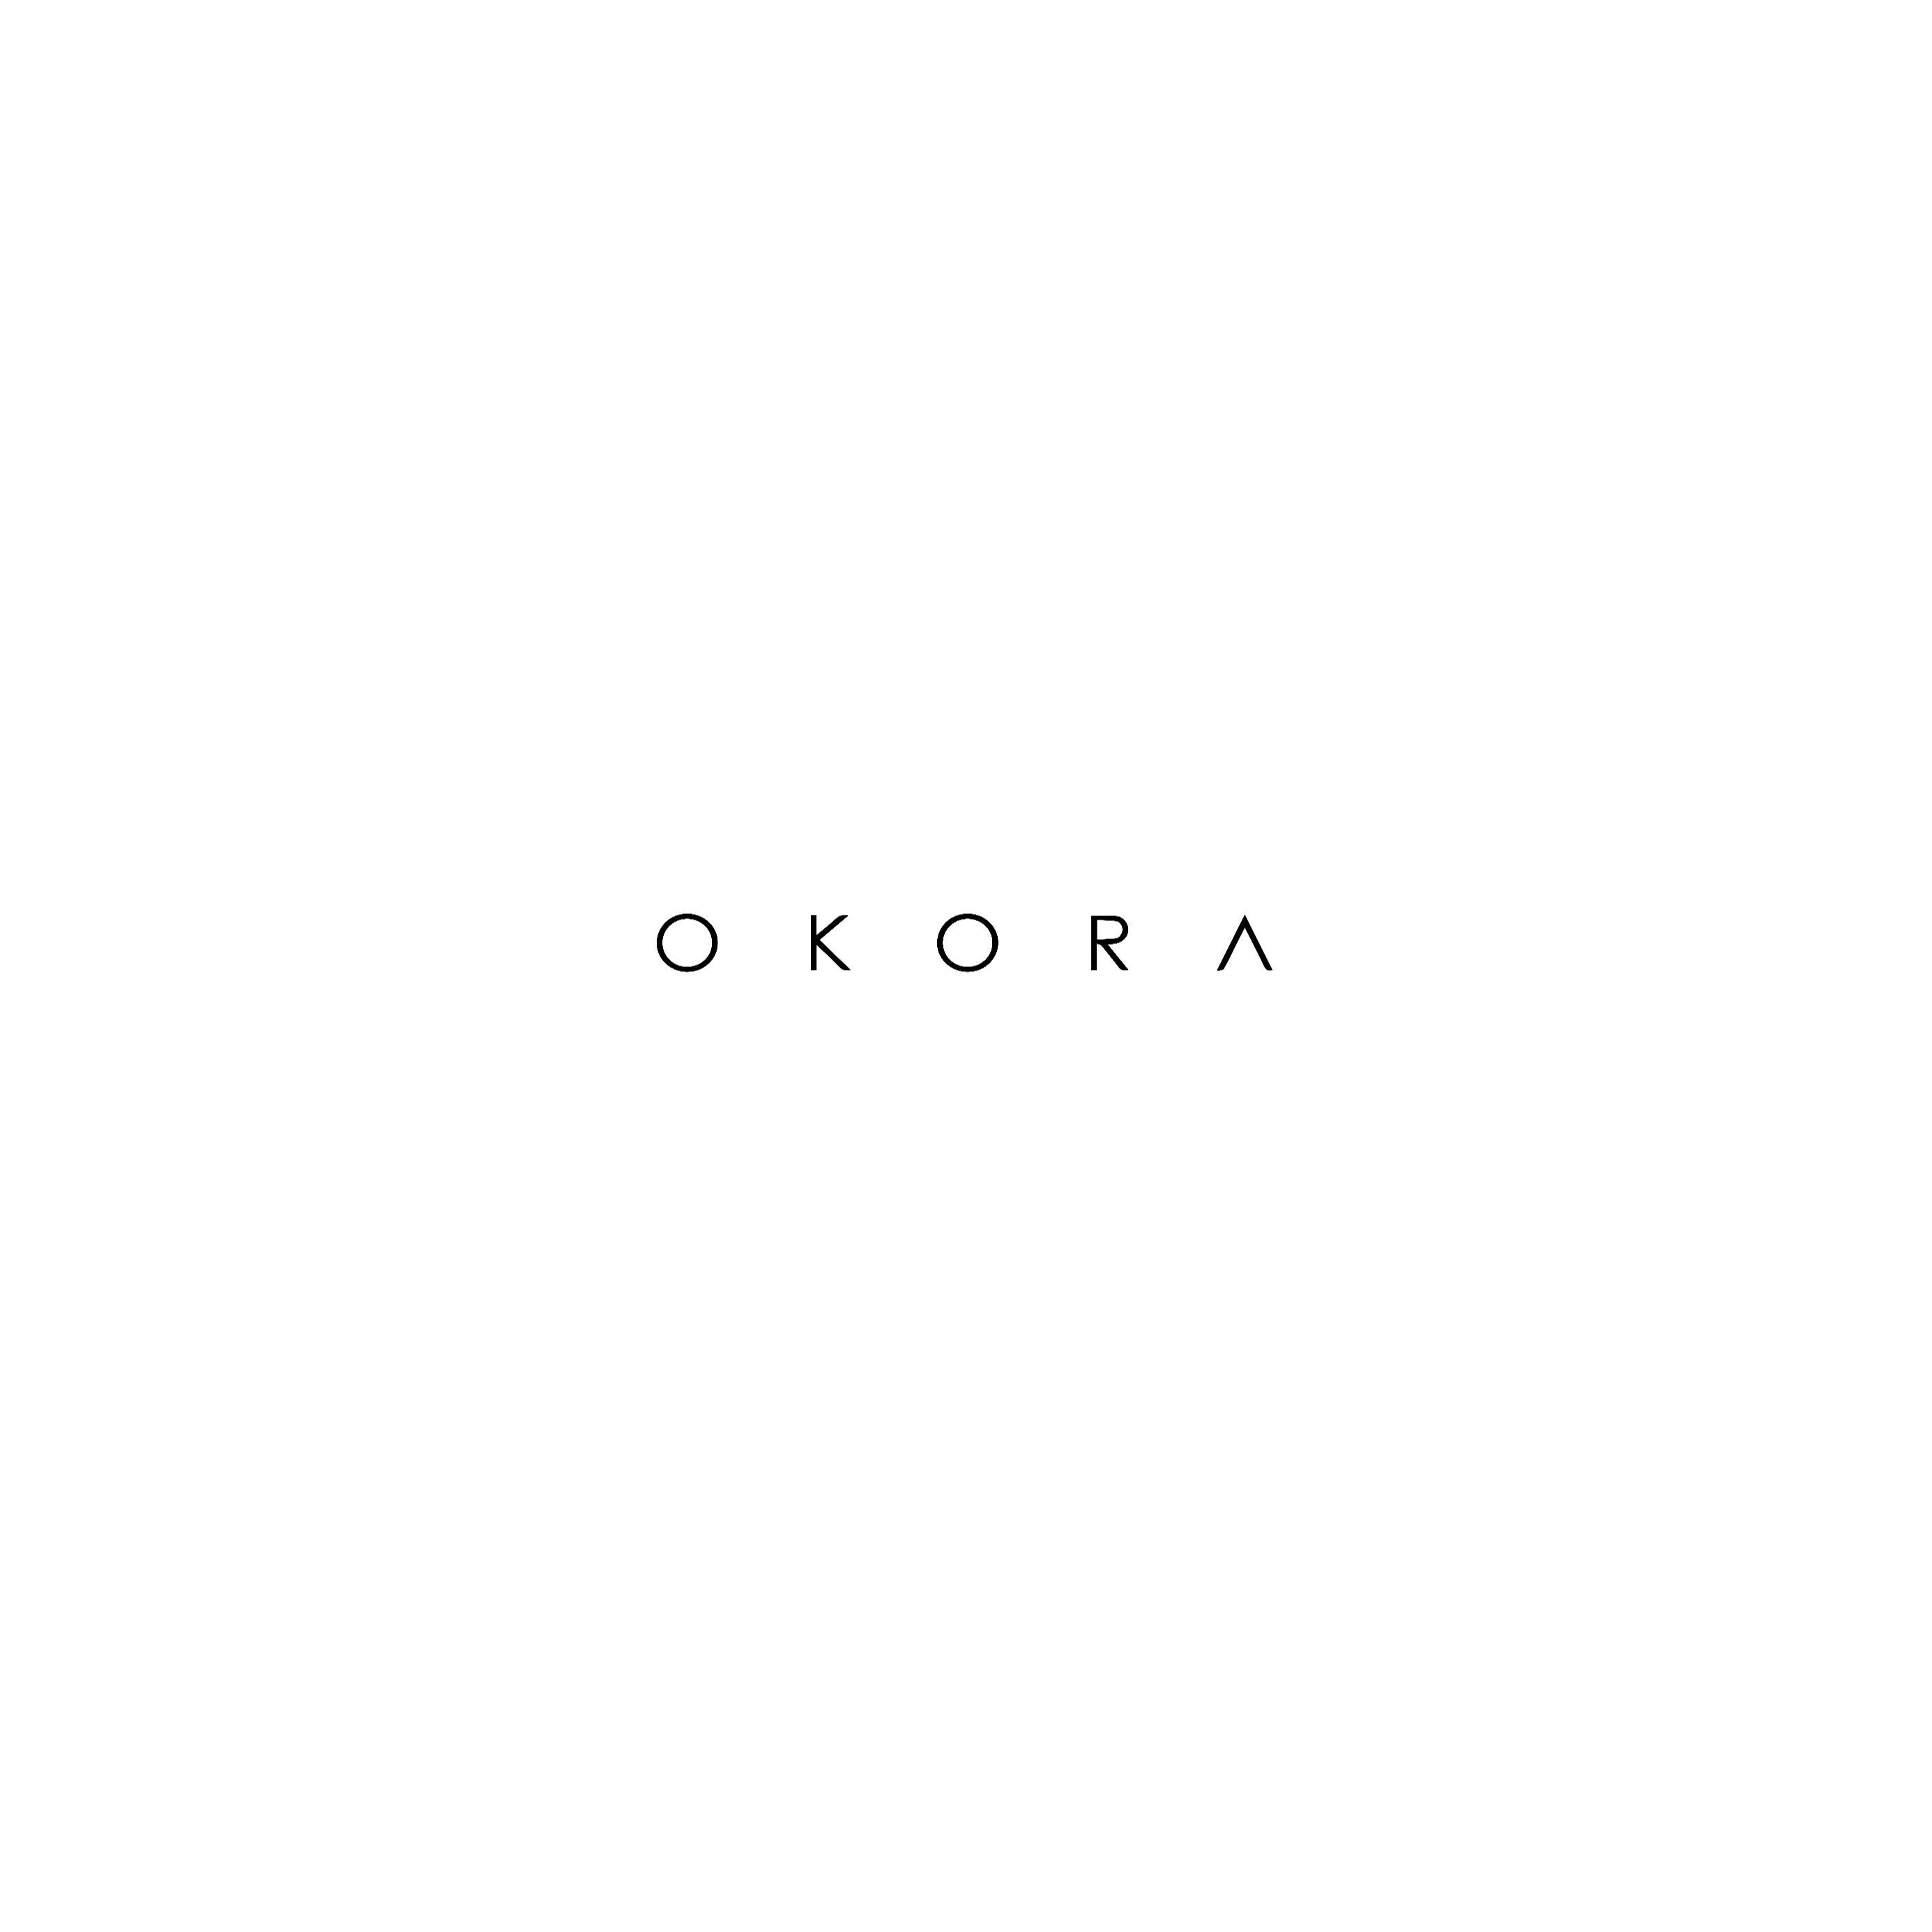 Okora